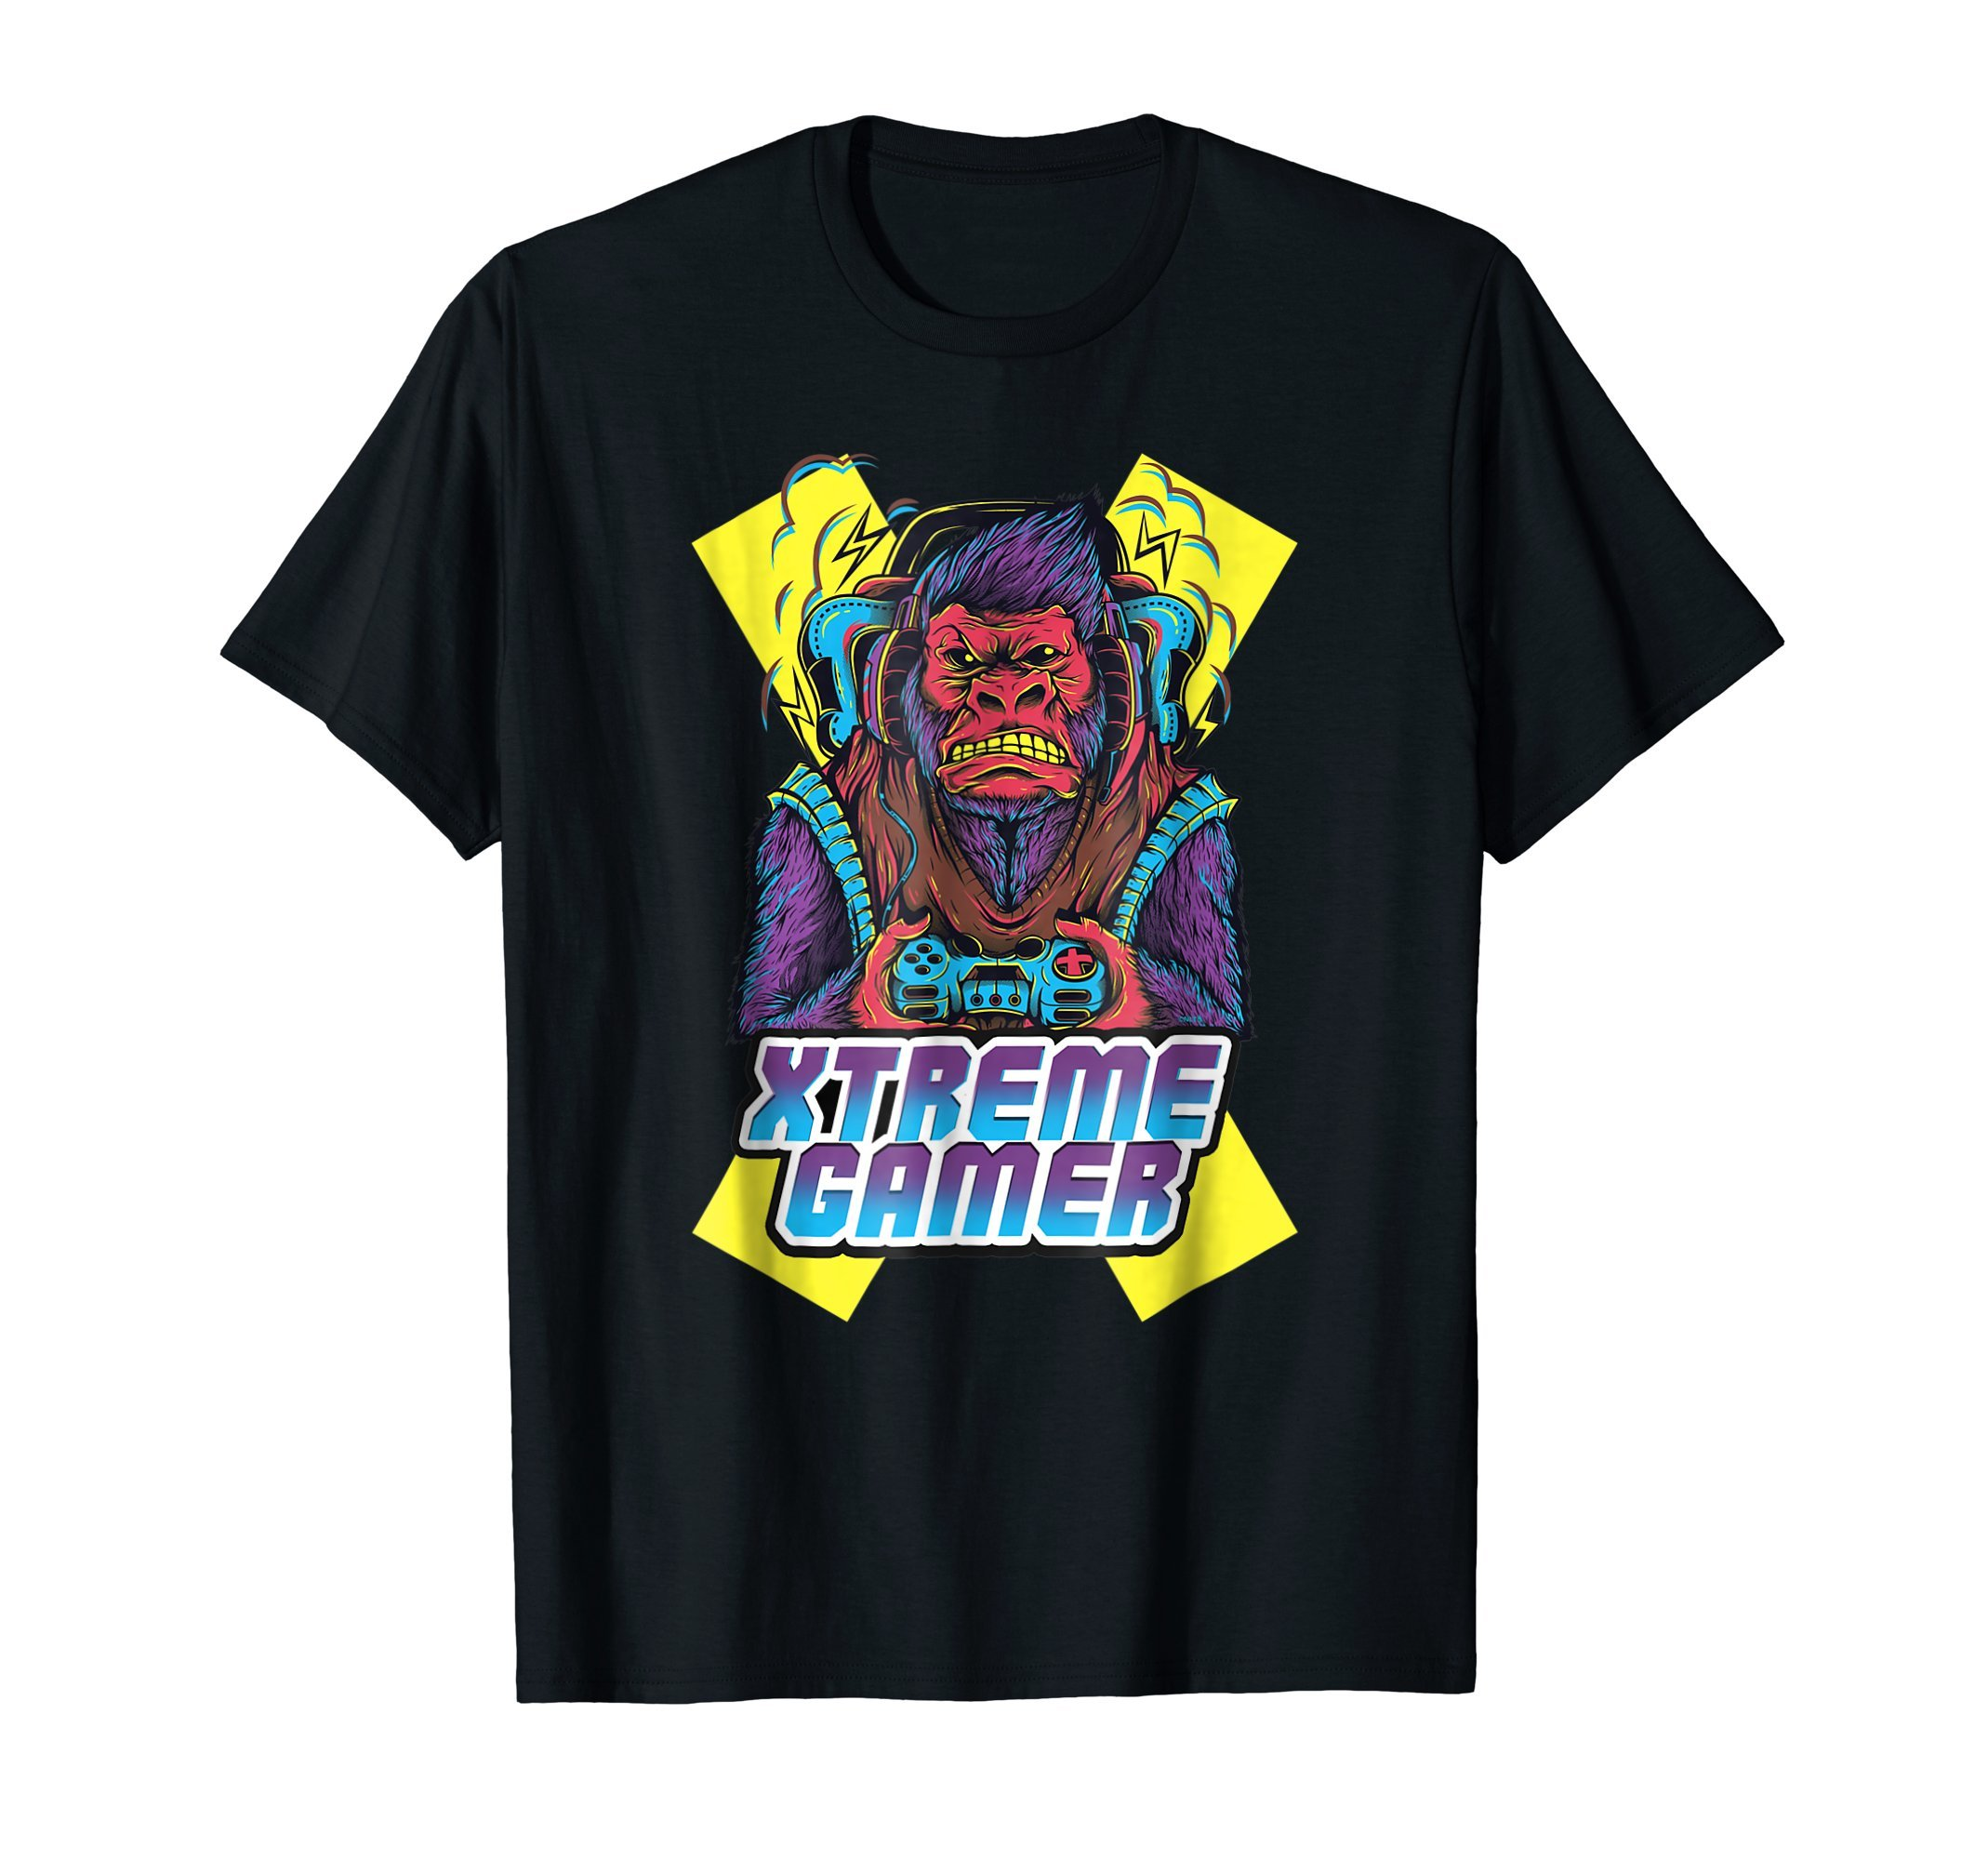 Extreme-Gorilla-Gamer-Funny-Humor-T-Shirt-Tee-Shirt-Gift